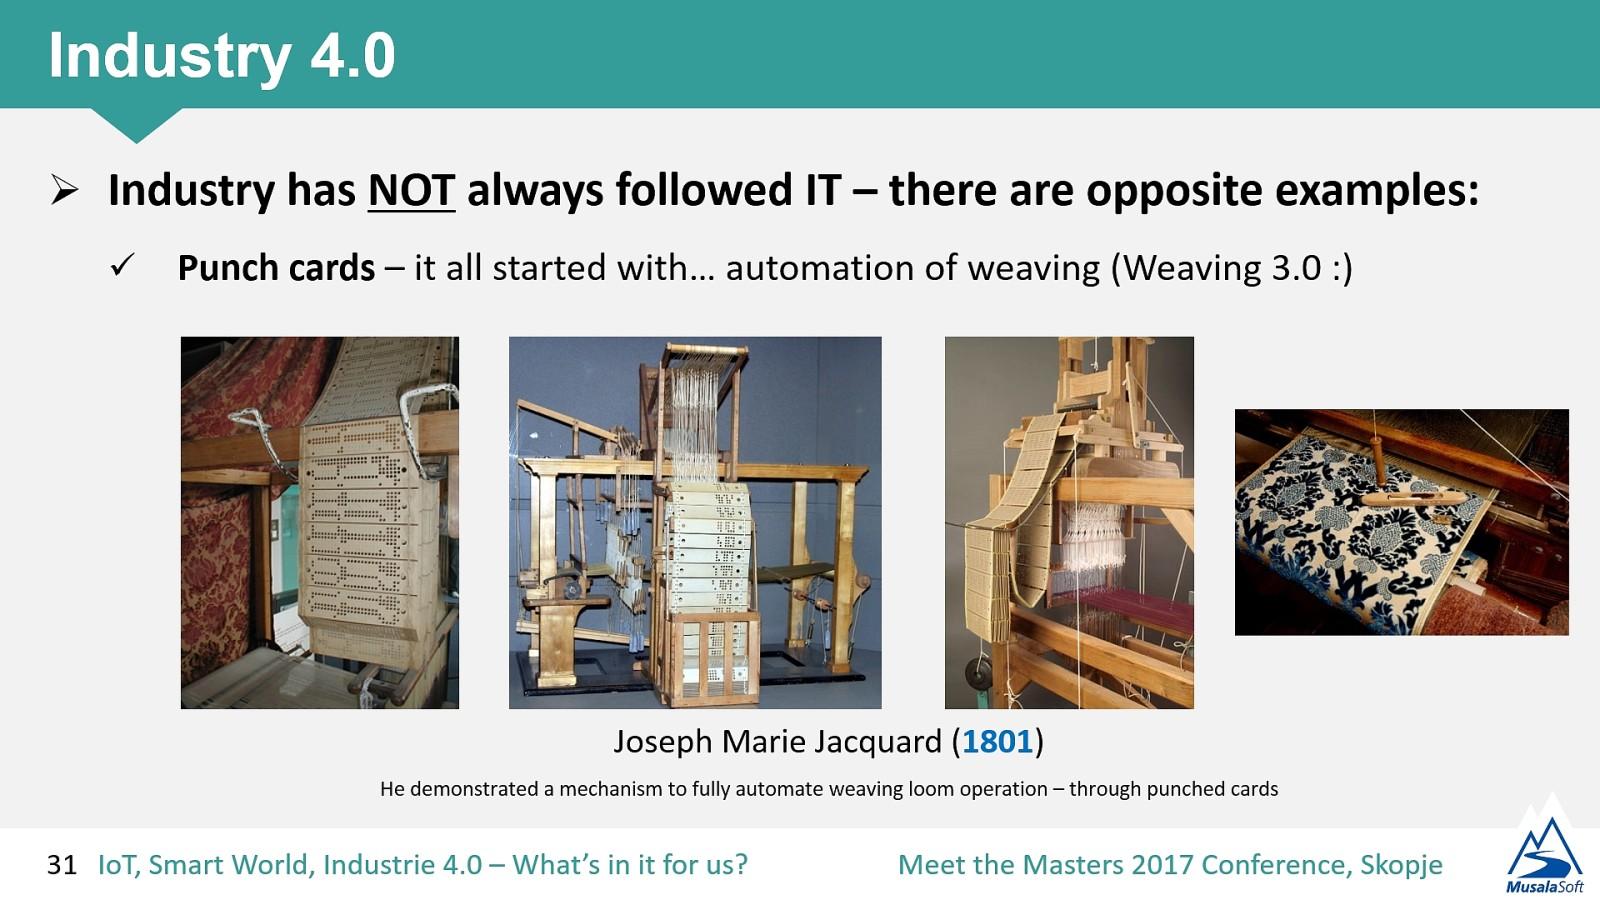 IoT, Smart World & Industry 4.0